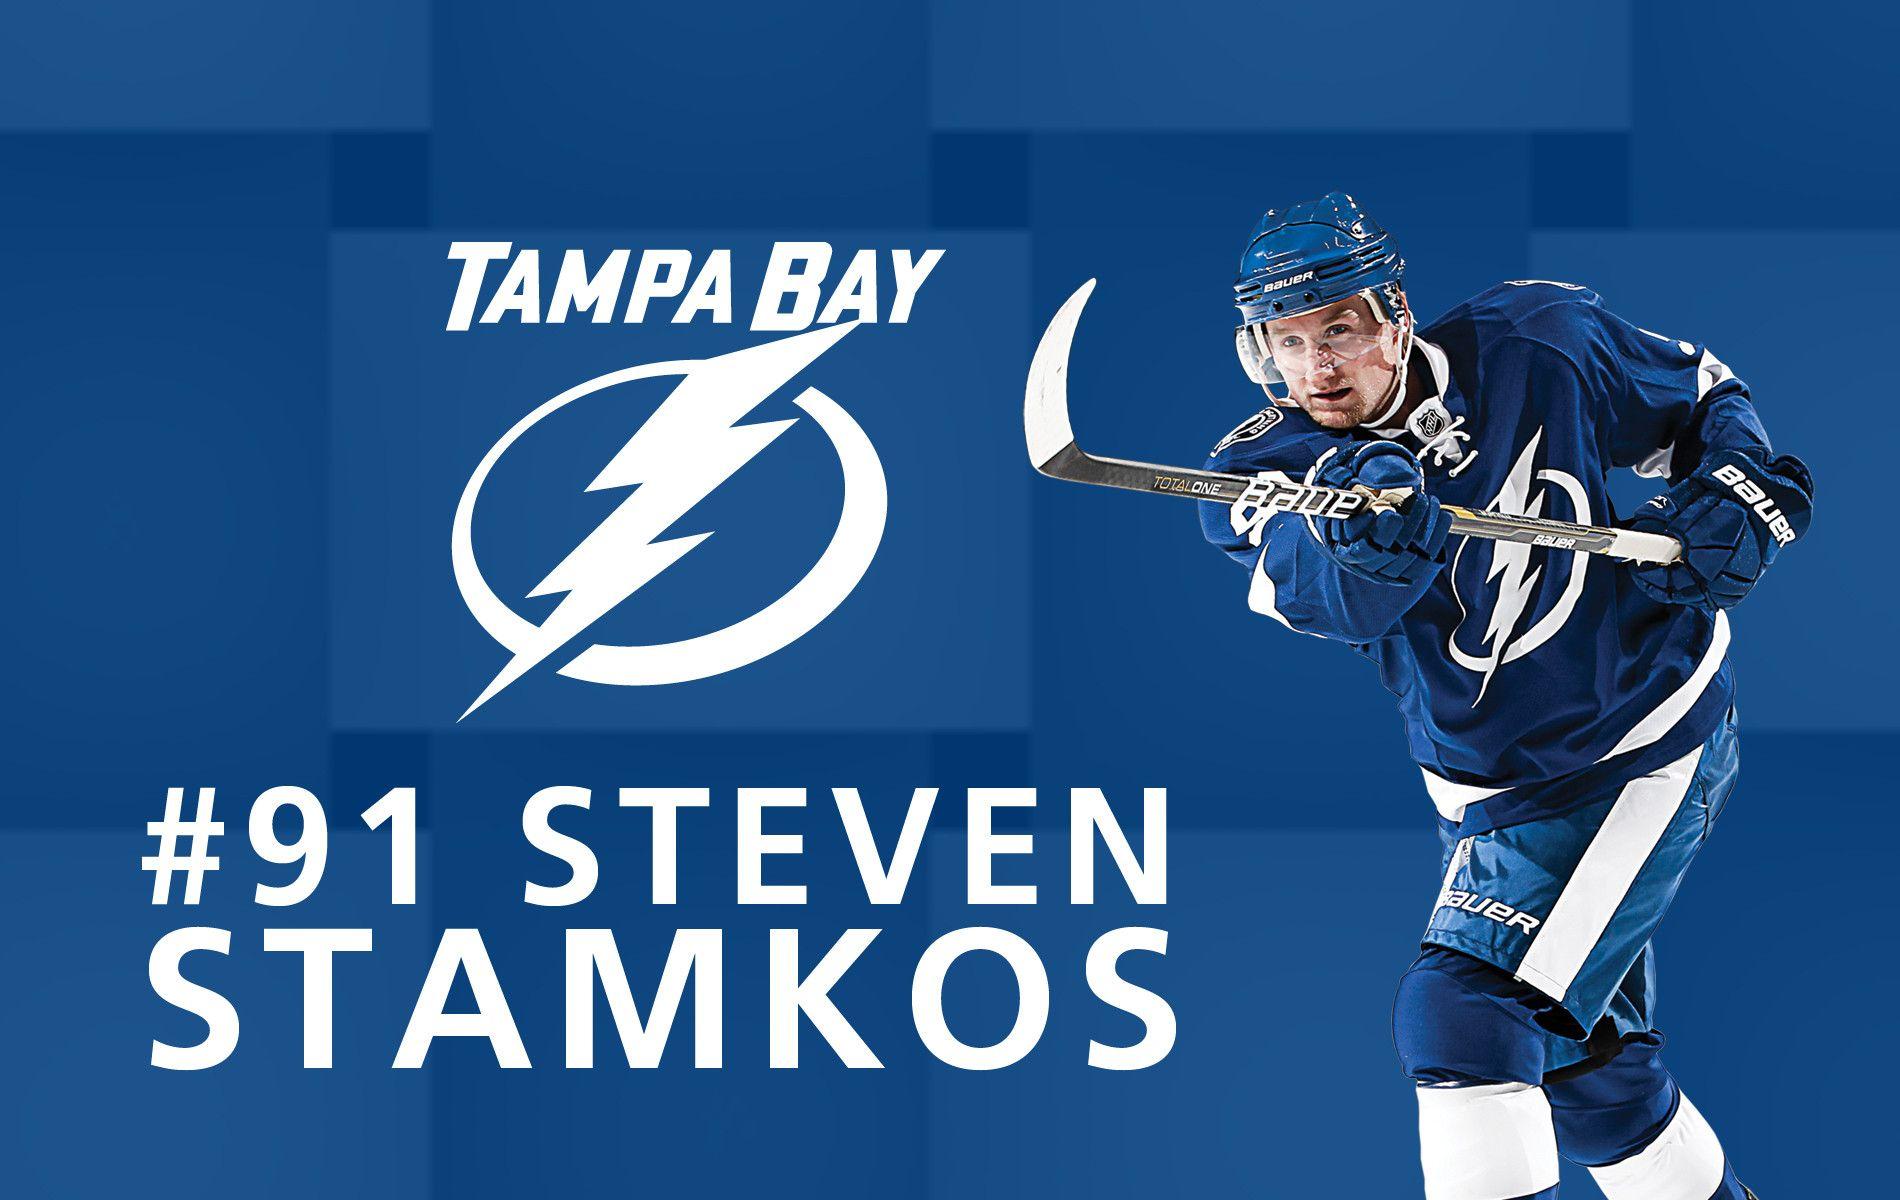 Tampa Bay Lightning Wallpapers 1900x1200